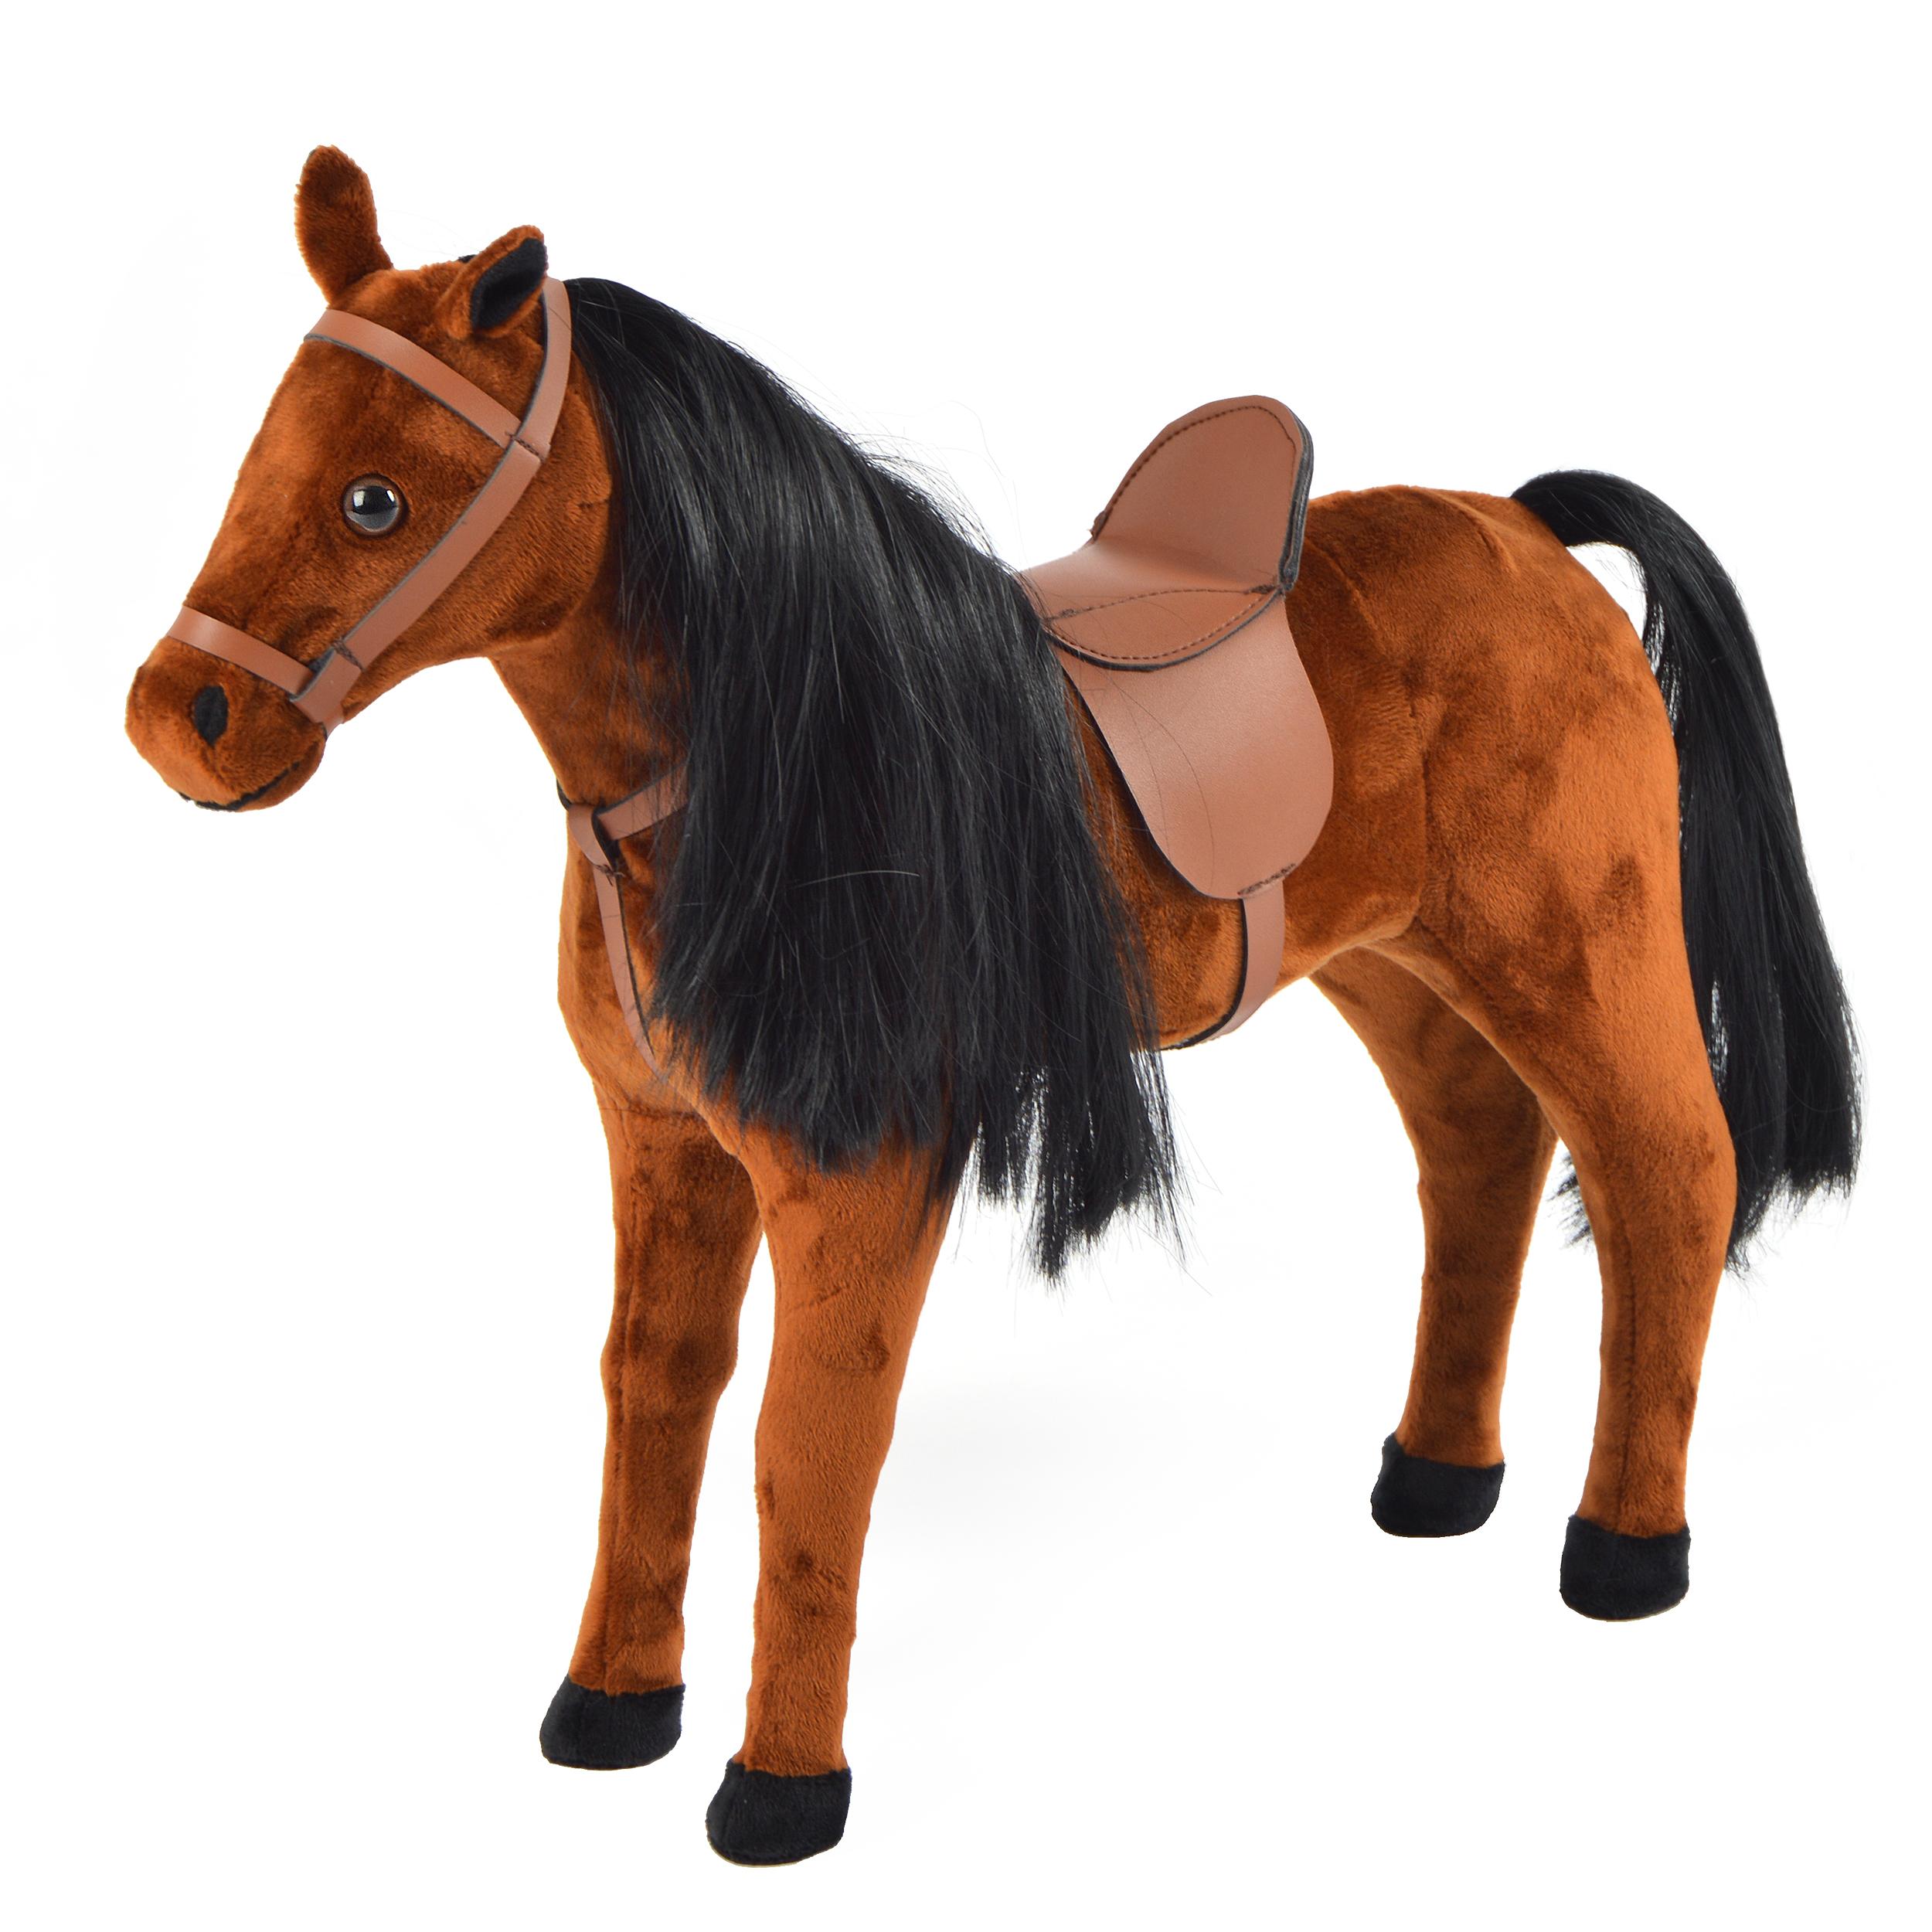 40 cm Pferd, Braun - Bronco